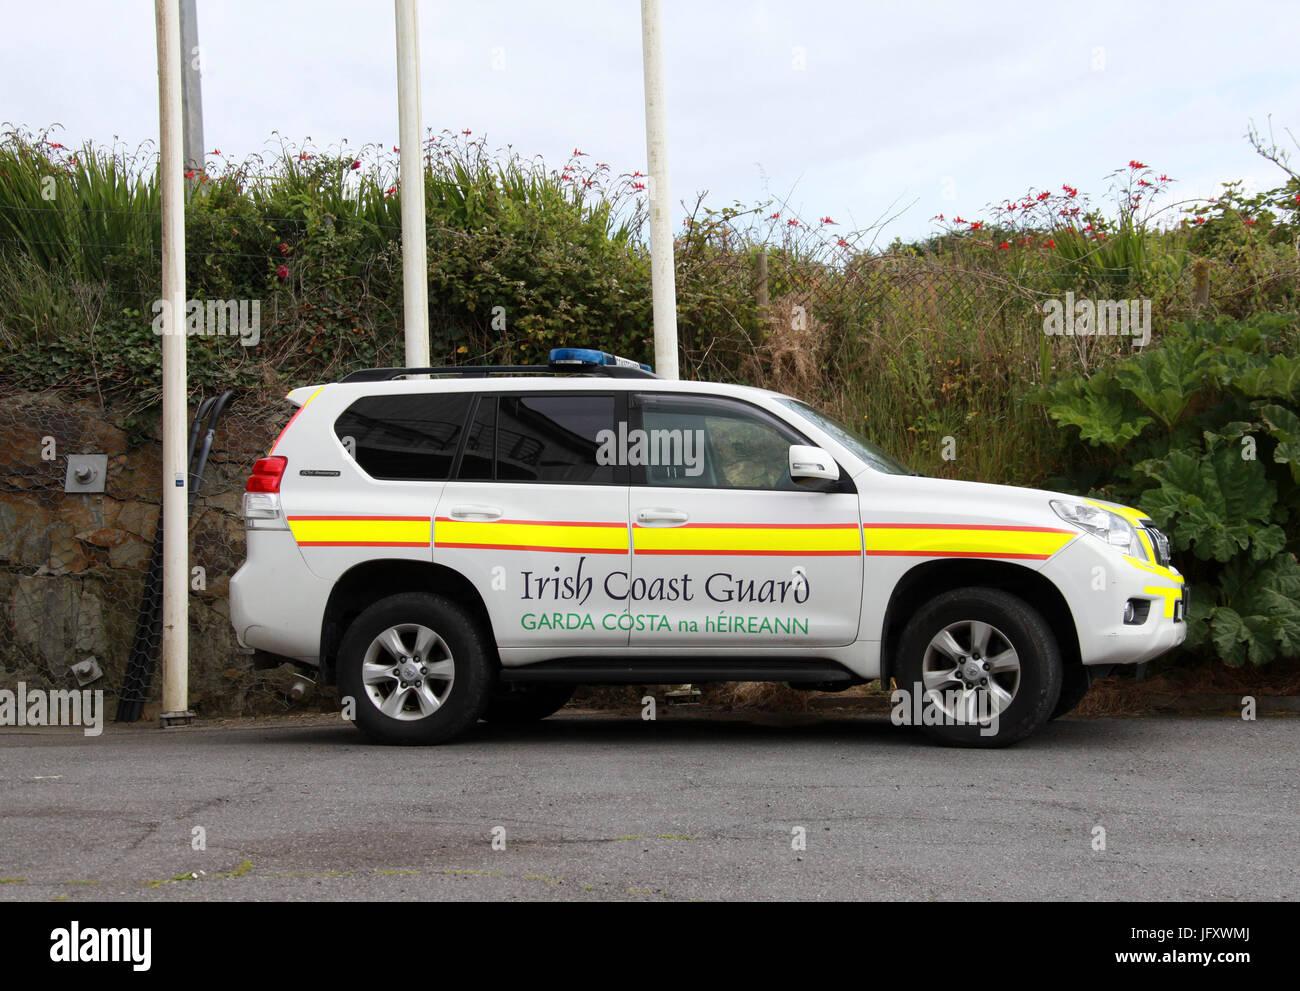 Irish Coast Guard Vehicle - Stock Image